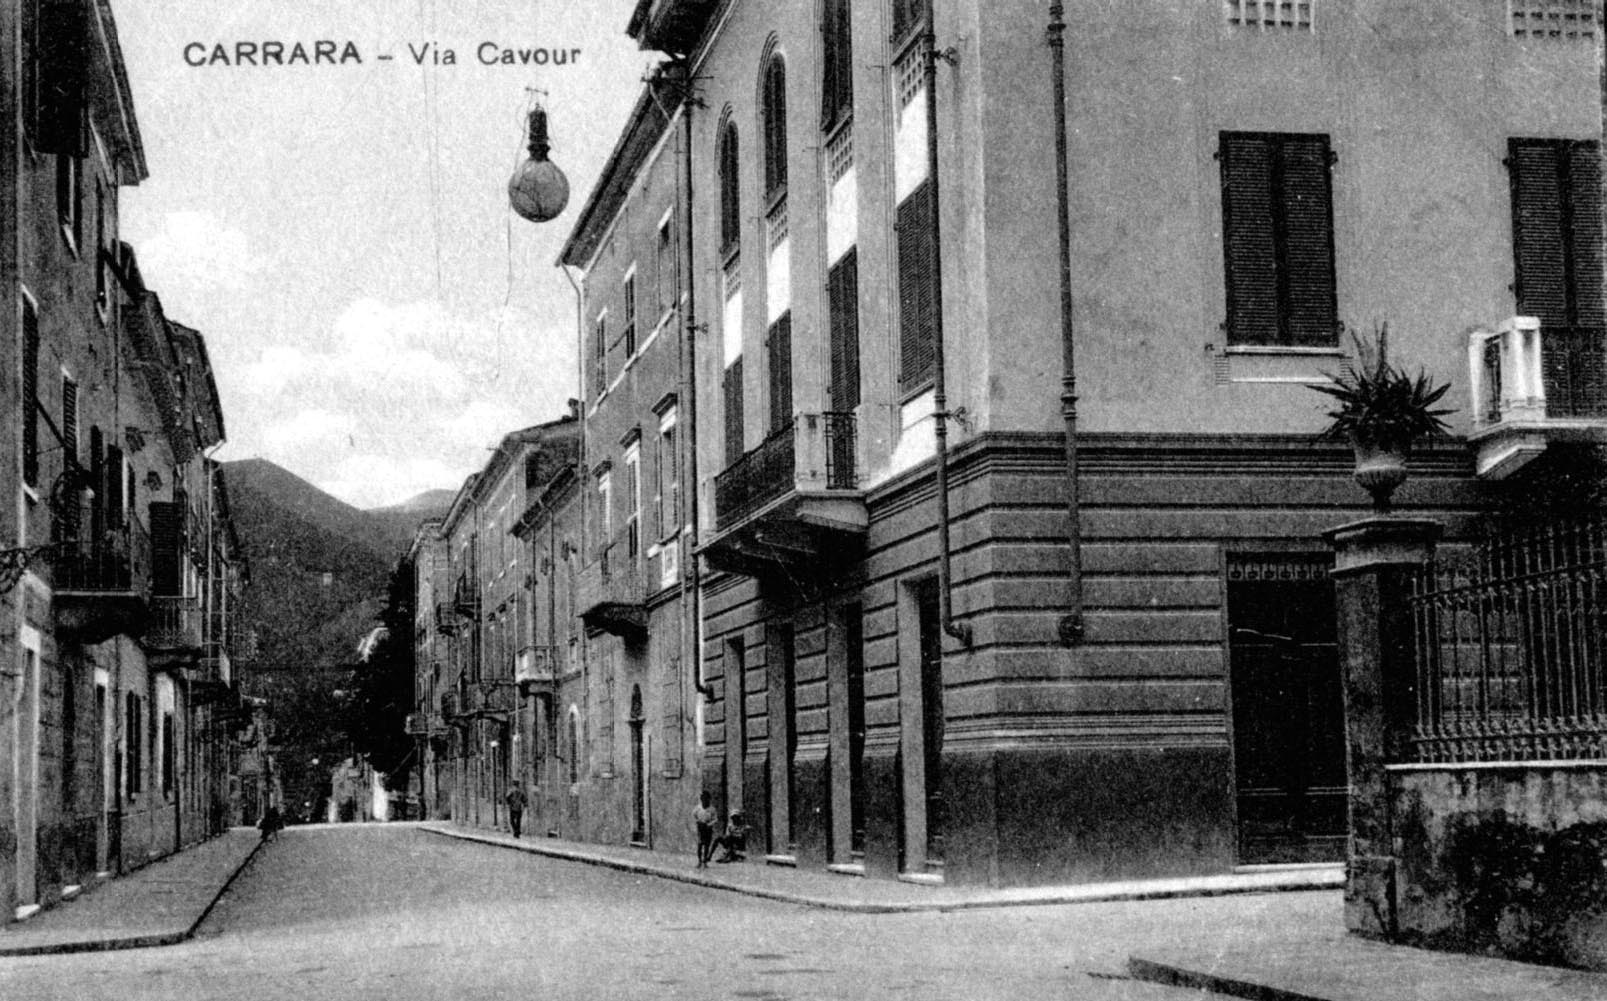 aq via Cavour